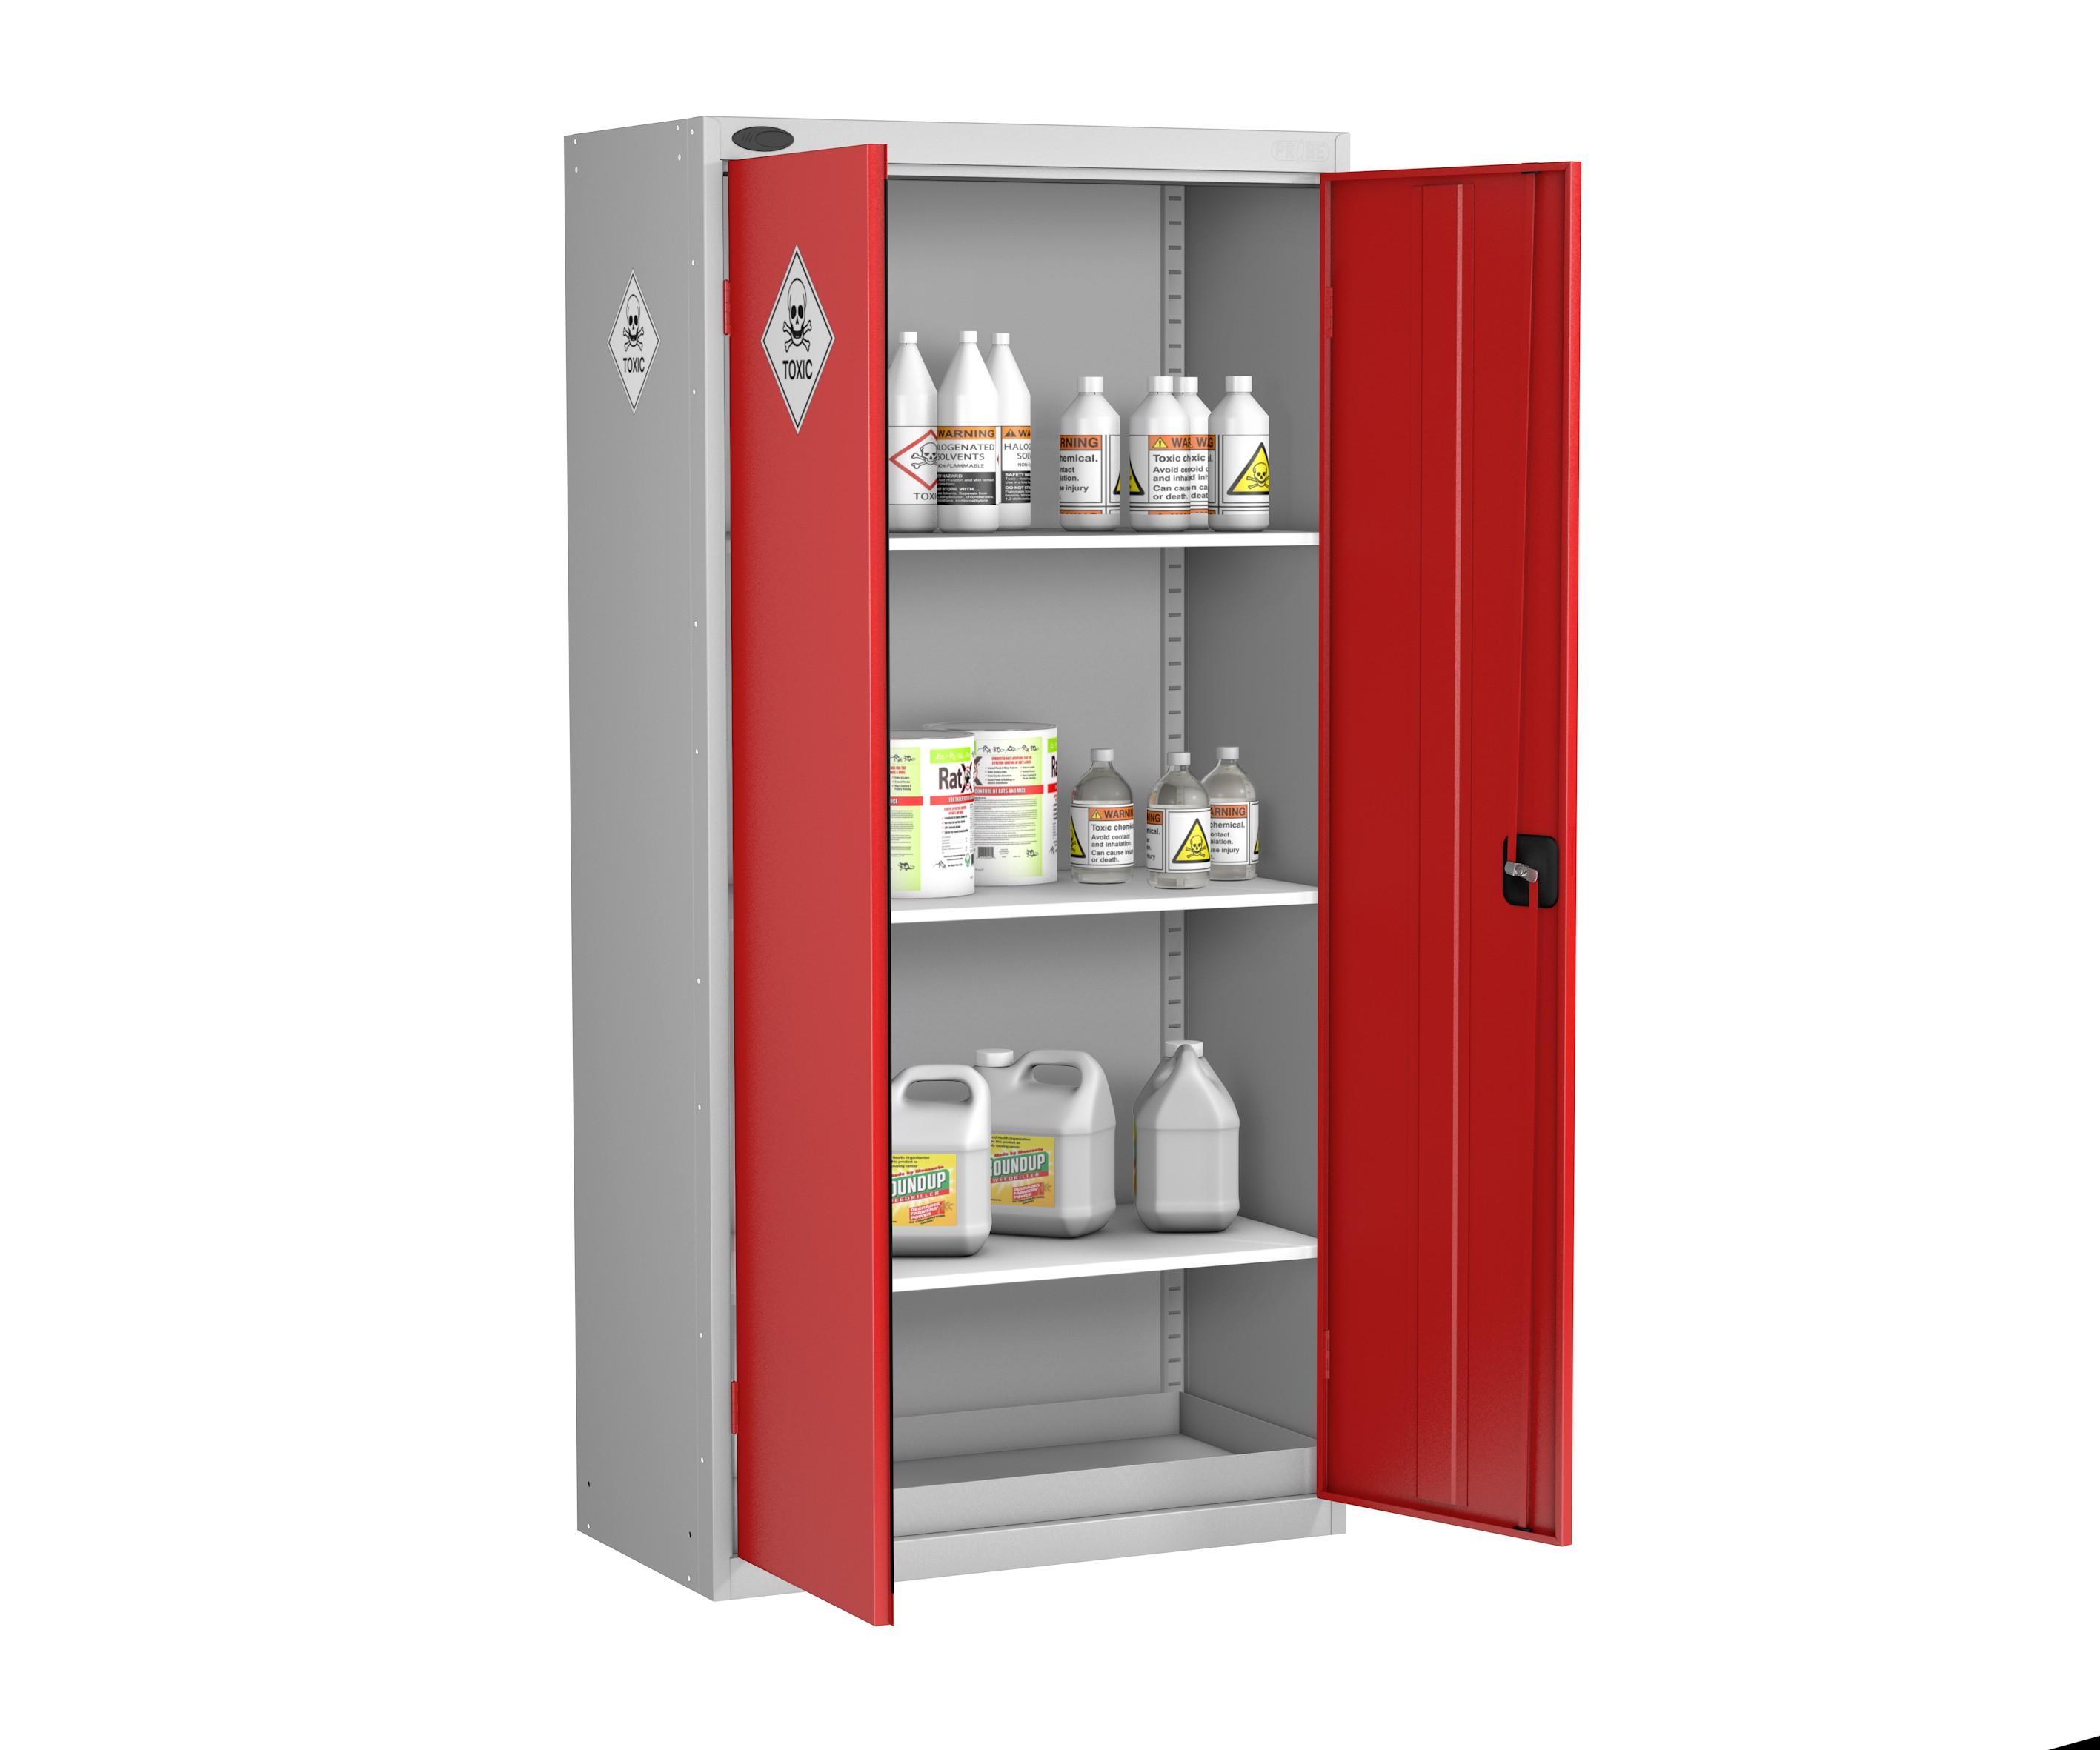 Standard Toxic Cabinet